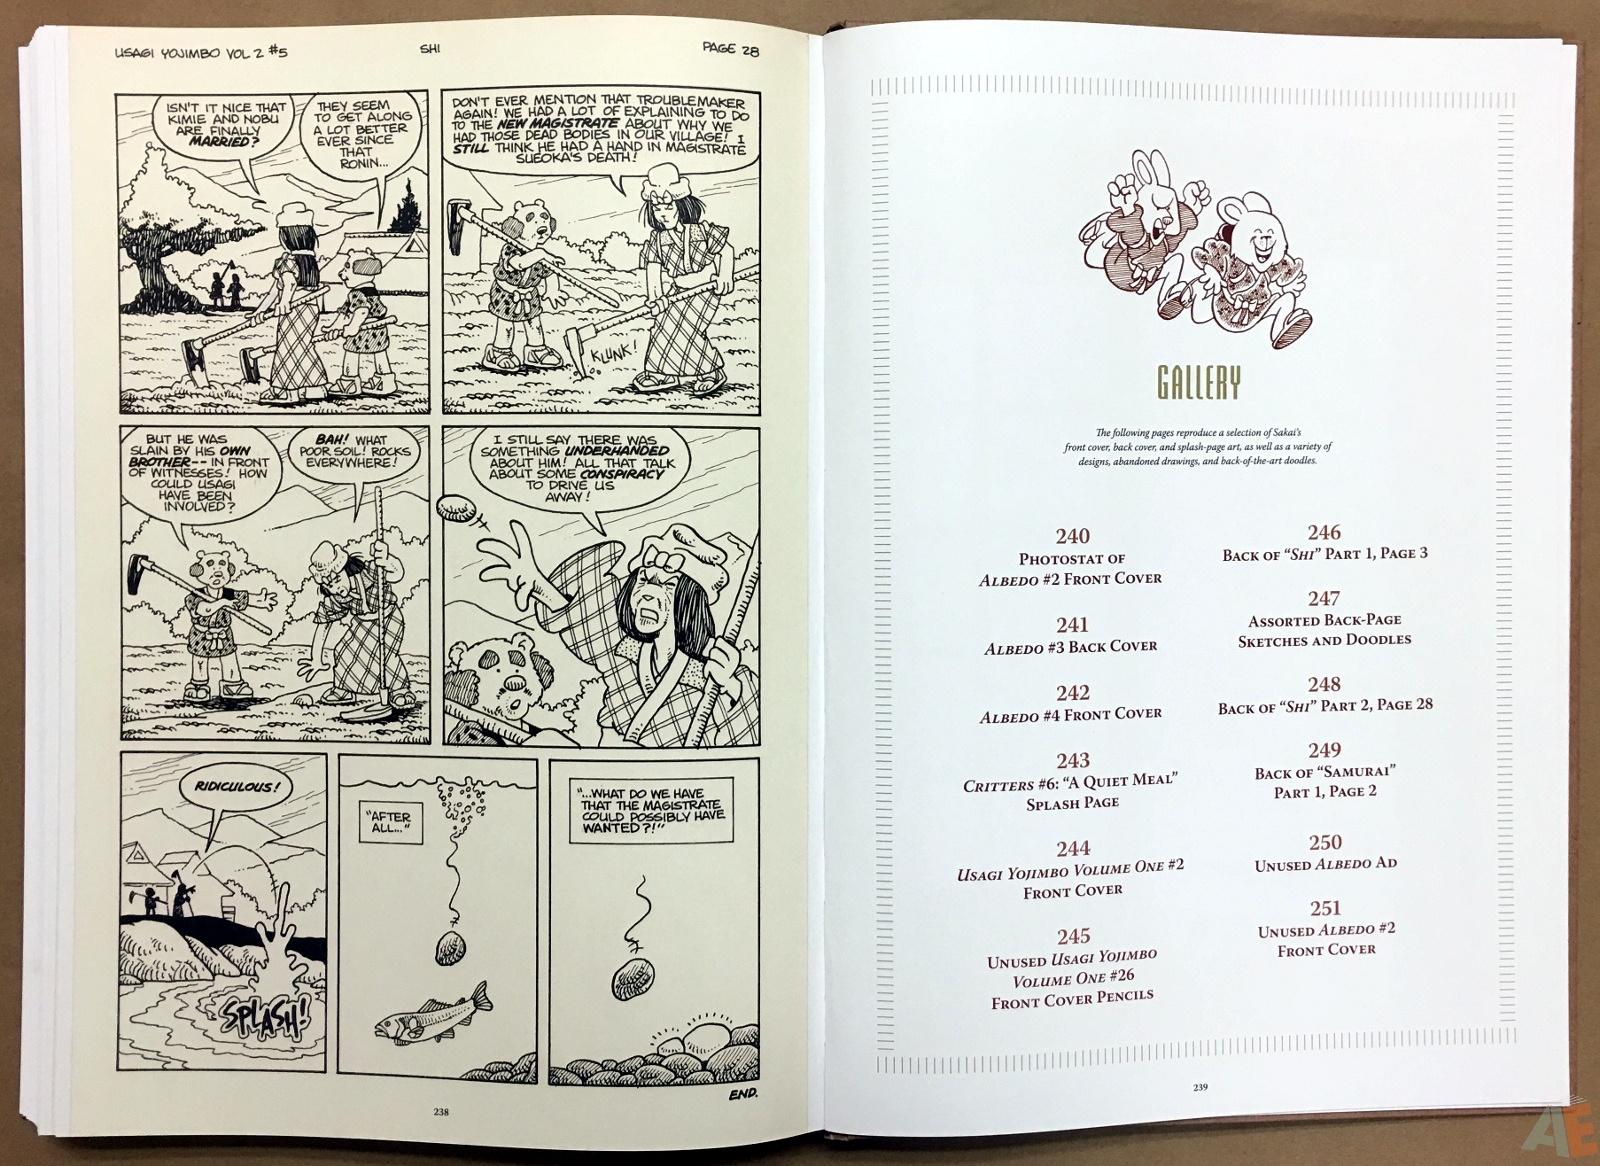 Usagi Yojimbo: Samurai and Other Stories Gallery Edition 42